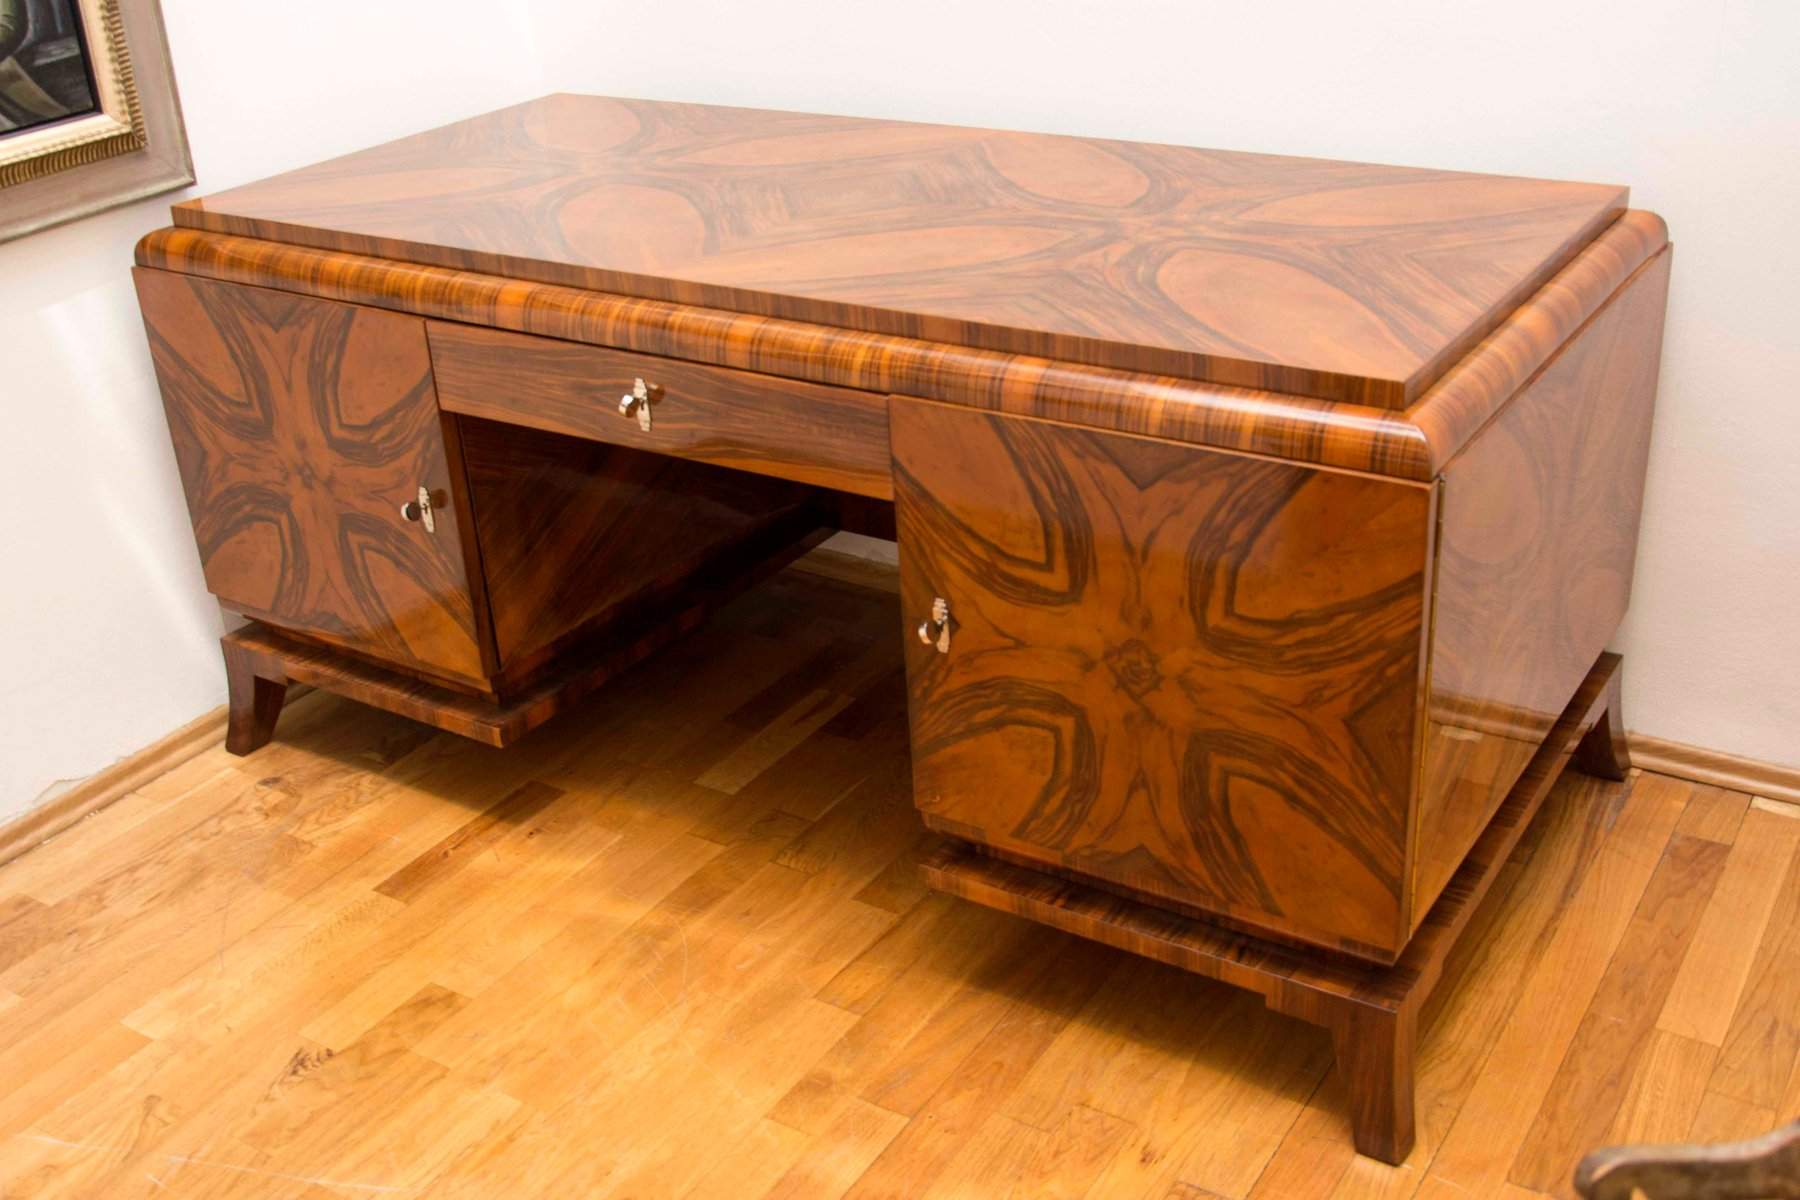 bureau art deco en noyer massif 1930s en vente sur pamono. Black Bedroom Furniture Sets. Home Design Ideas